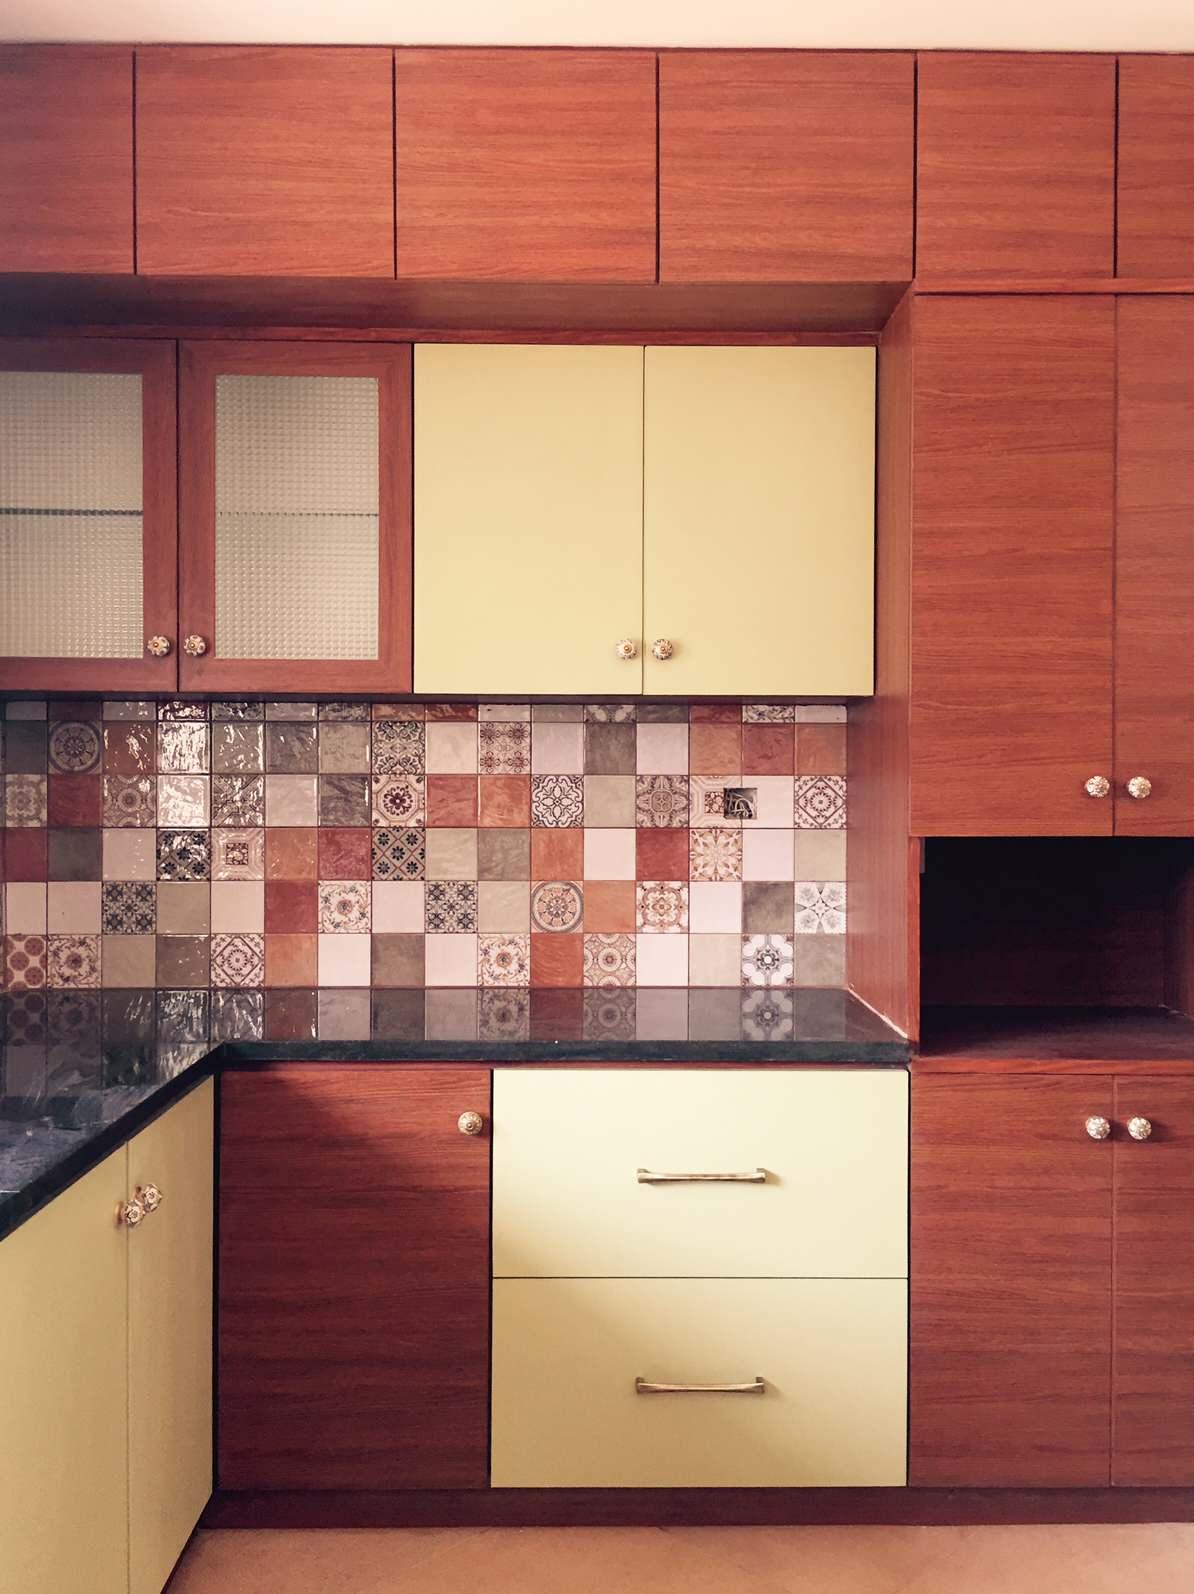 Indian Kitchen Tile Photos, Designs & Ideas